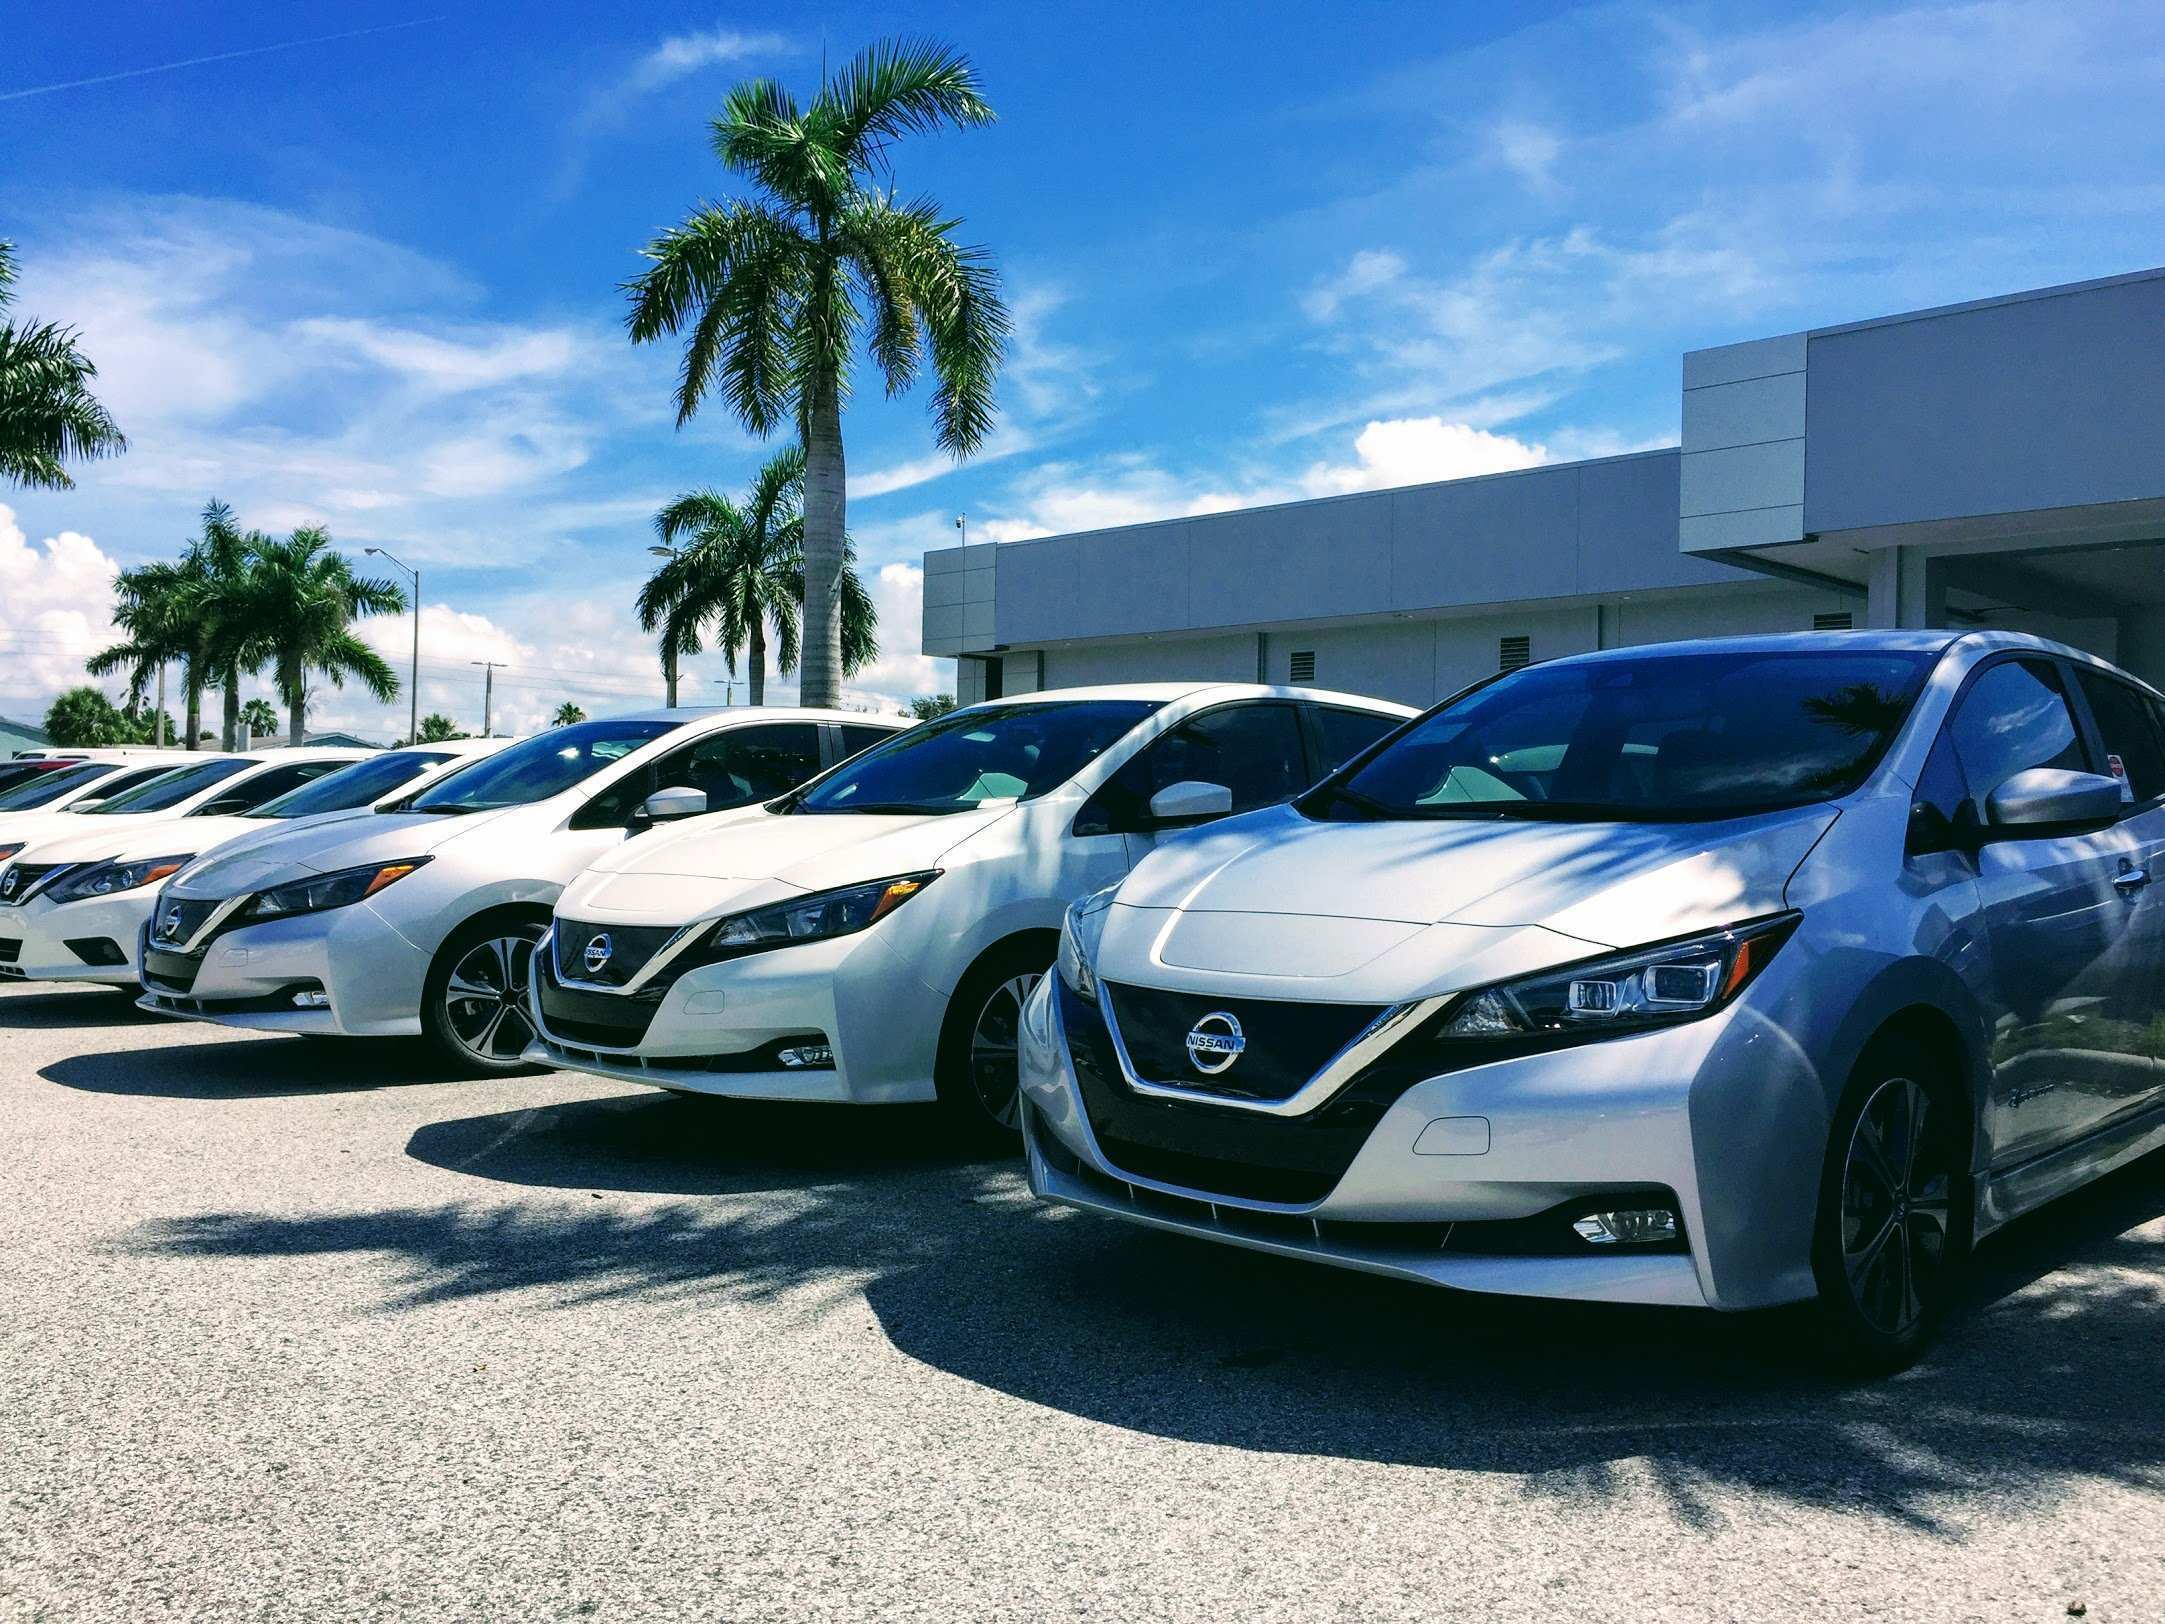 49 Gallery of 2019 Nissan Leaf Photos for 2019 Nissan Leaf